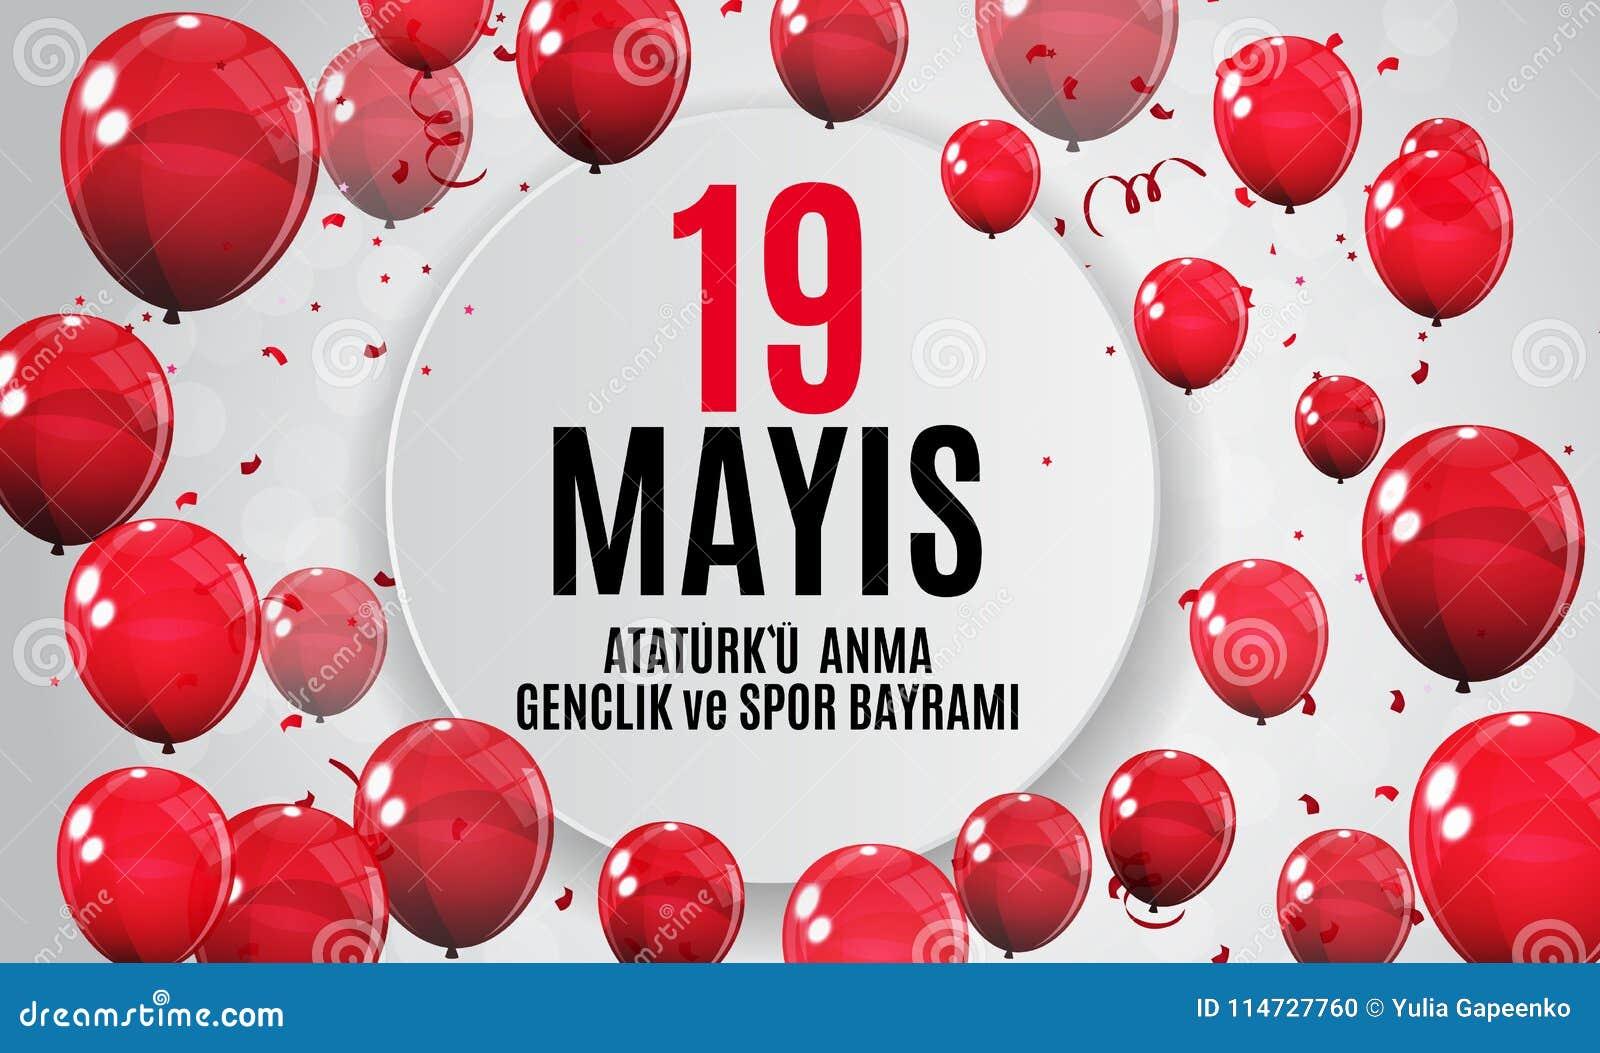 19th may commemoration of Ataturk, youth and sports day Turkish Speak: 19 mayis Ataturk`u anma, genclik ve spor bayrami